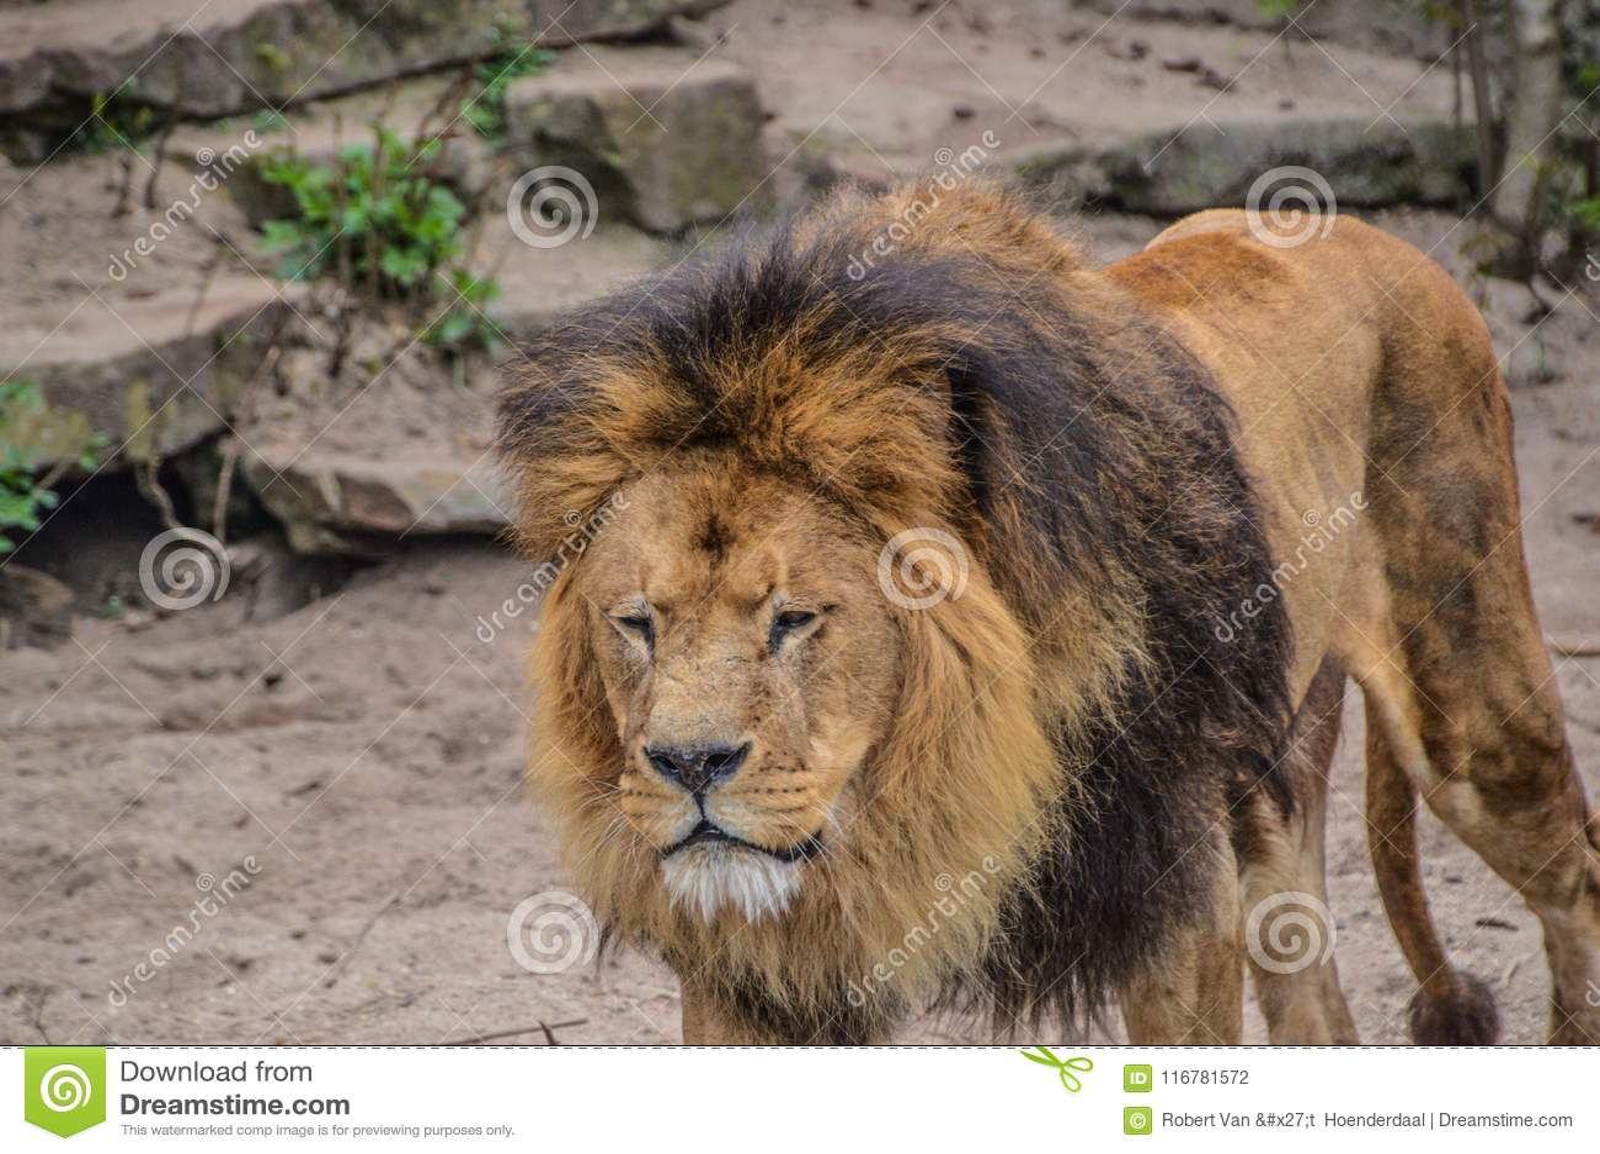 Zoo masculin de Lion Walking Around At The Artis